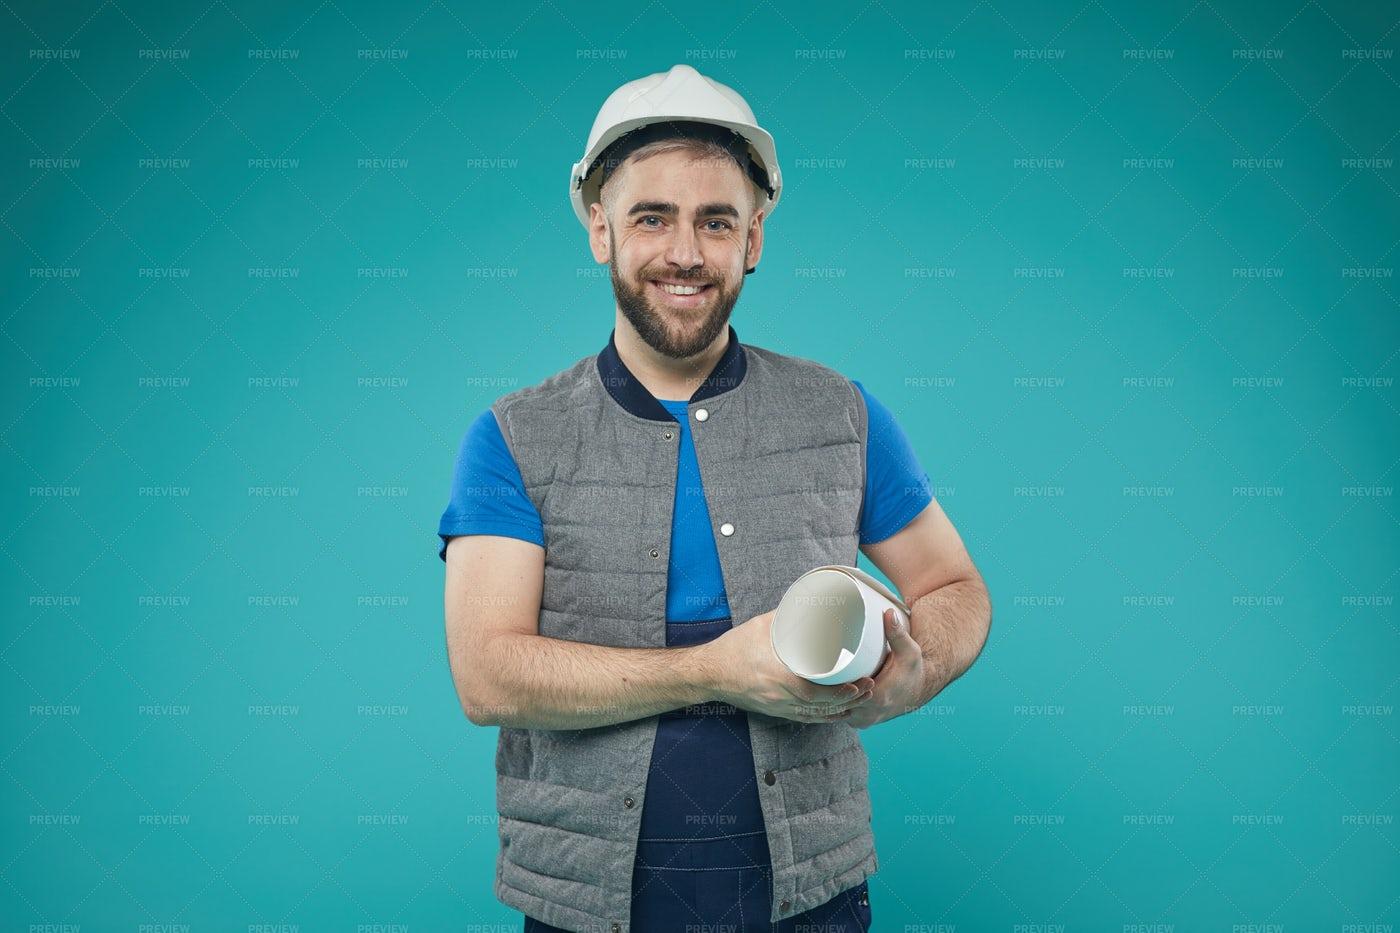 Caucasian Male Engineer Portrait: Stock Photos